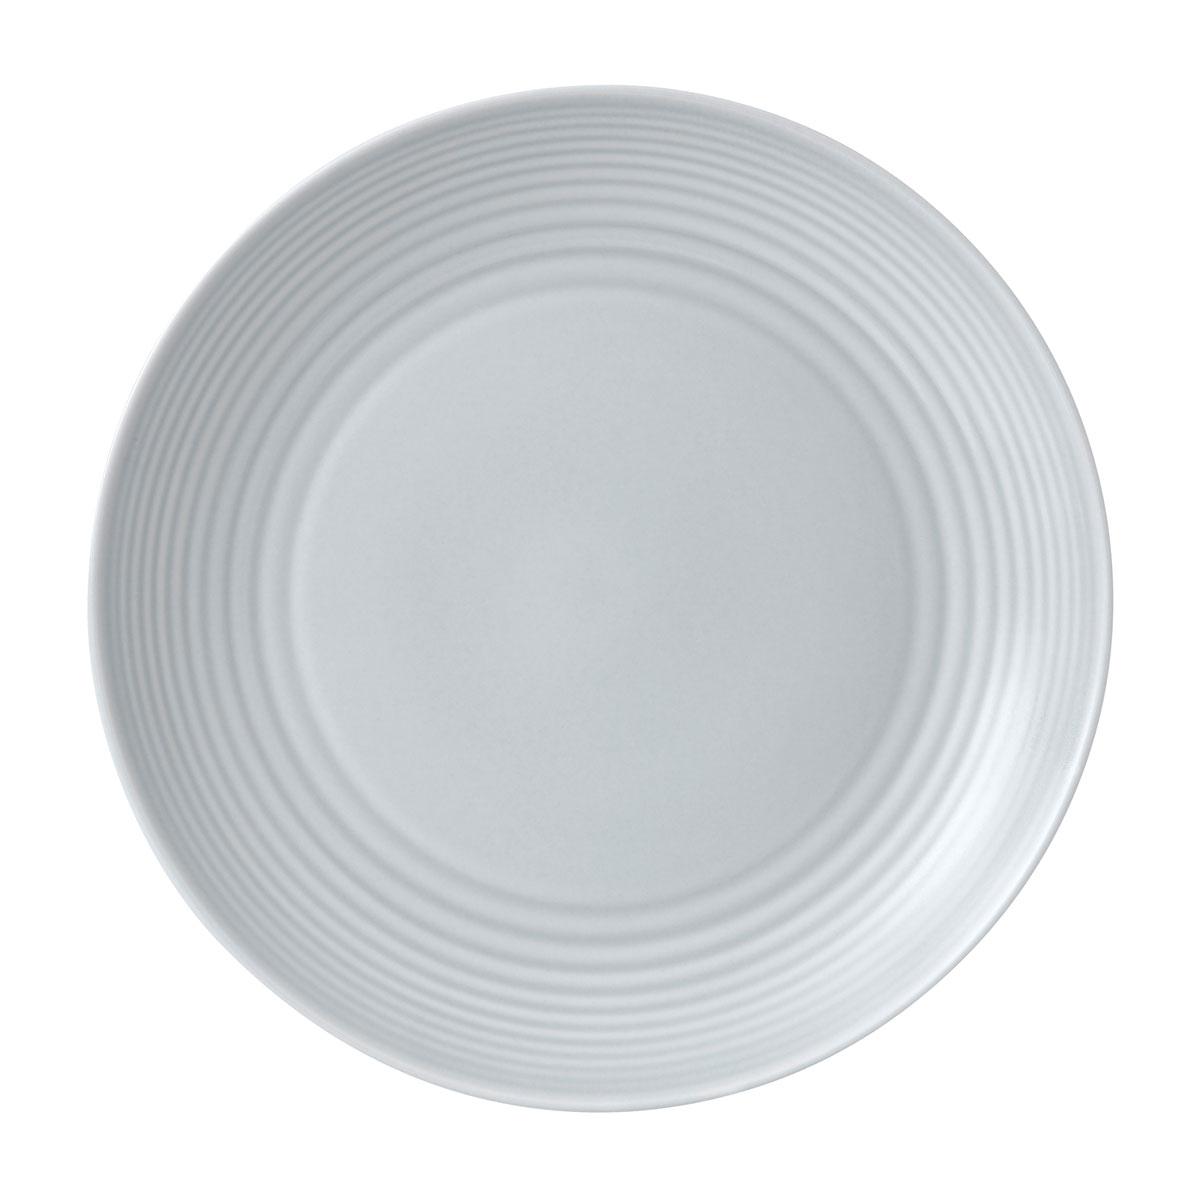 Royal Doulton Gordon Ramsay Maze Light Grey Dinner Plate